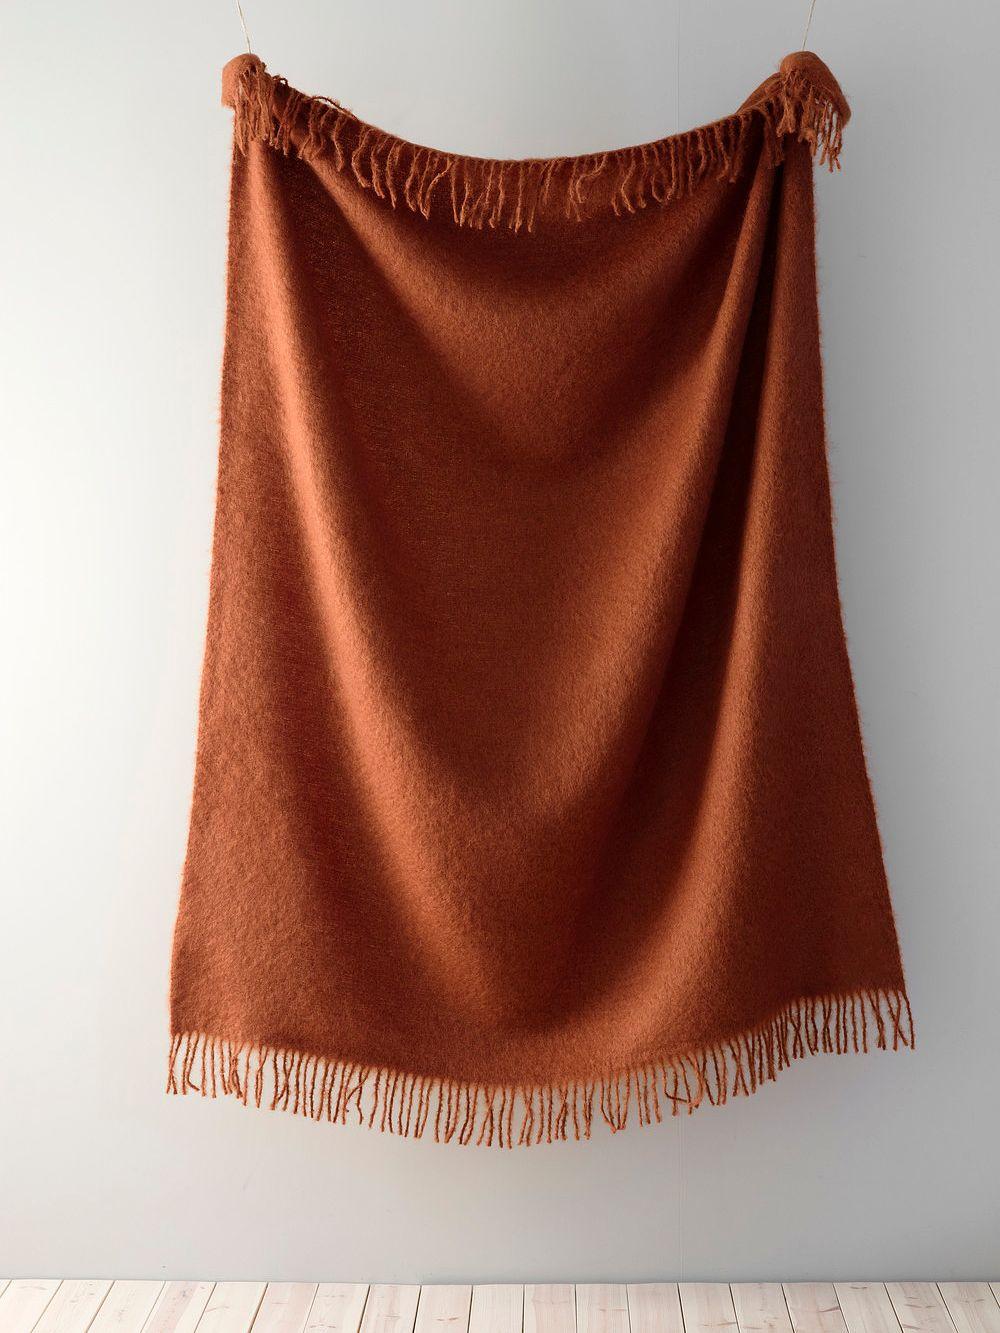 Lapuan Kankurit Saaga Uni mohair blanket, cinnamon